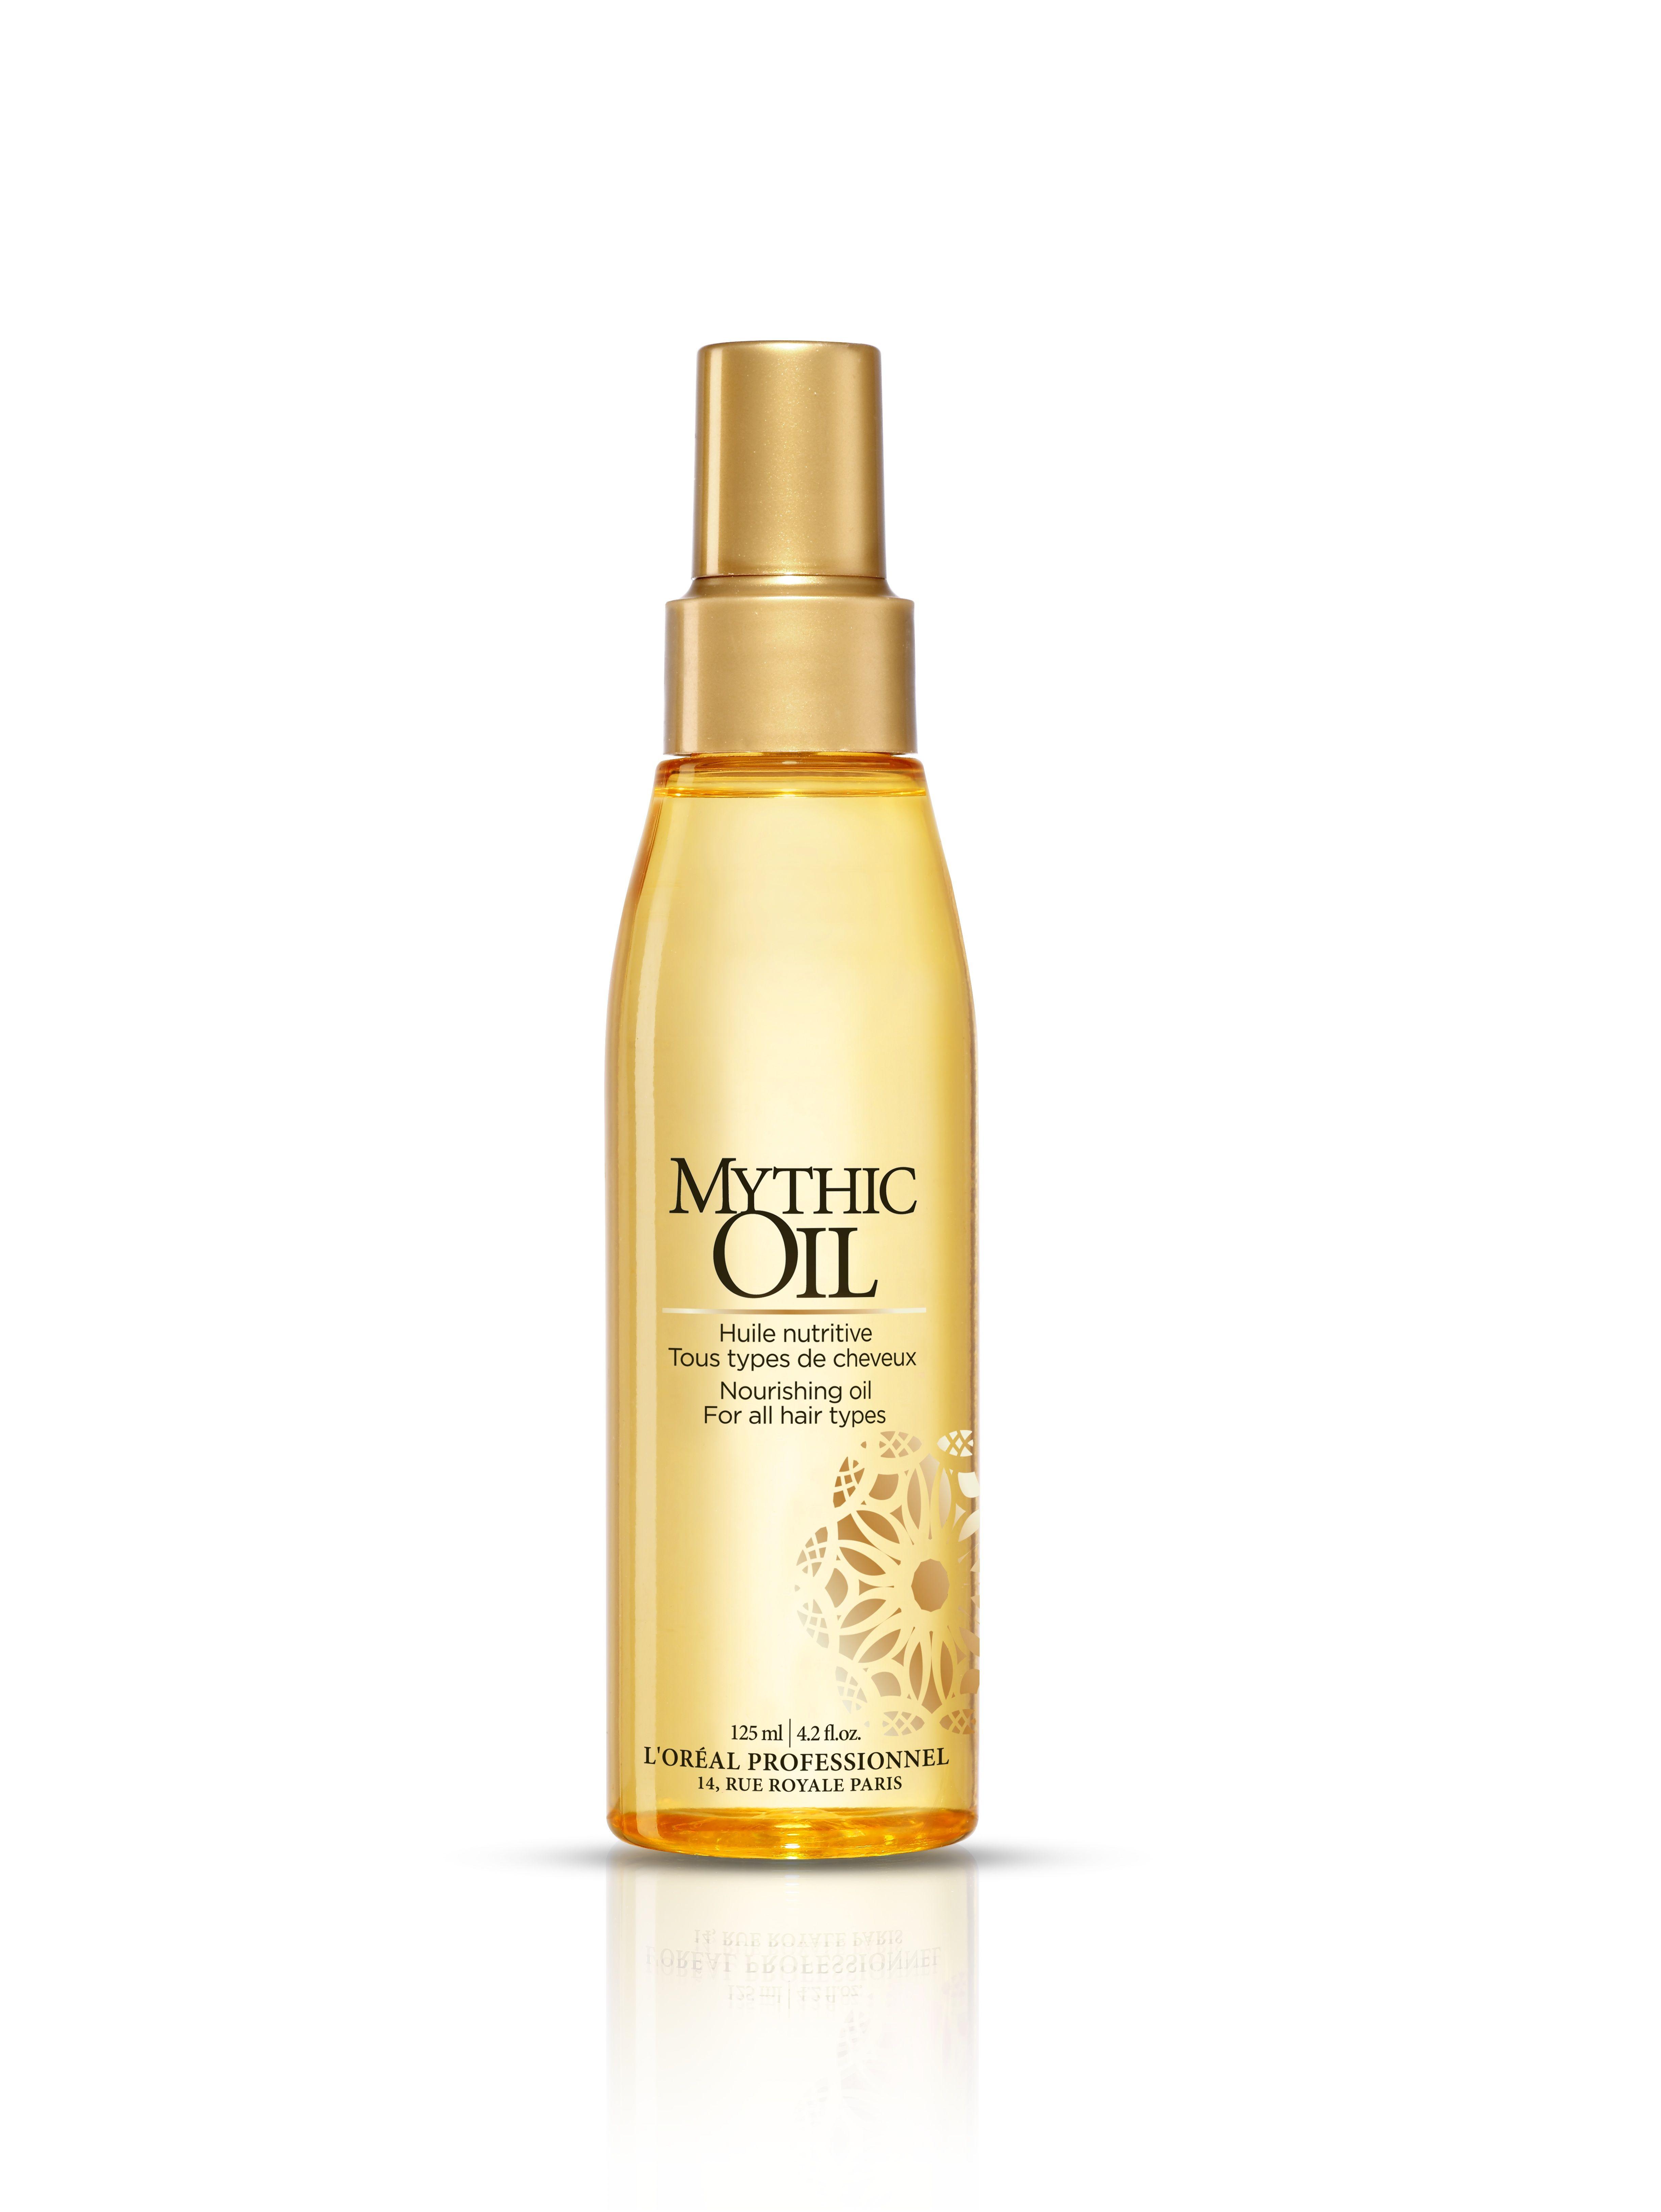 L'Oréal Professionnel, Mythic Oil Hair oil, Loreal, Damp